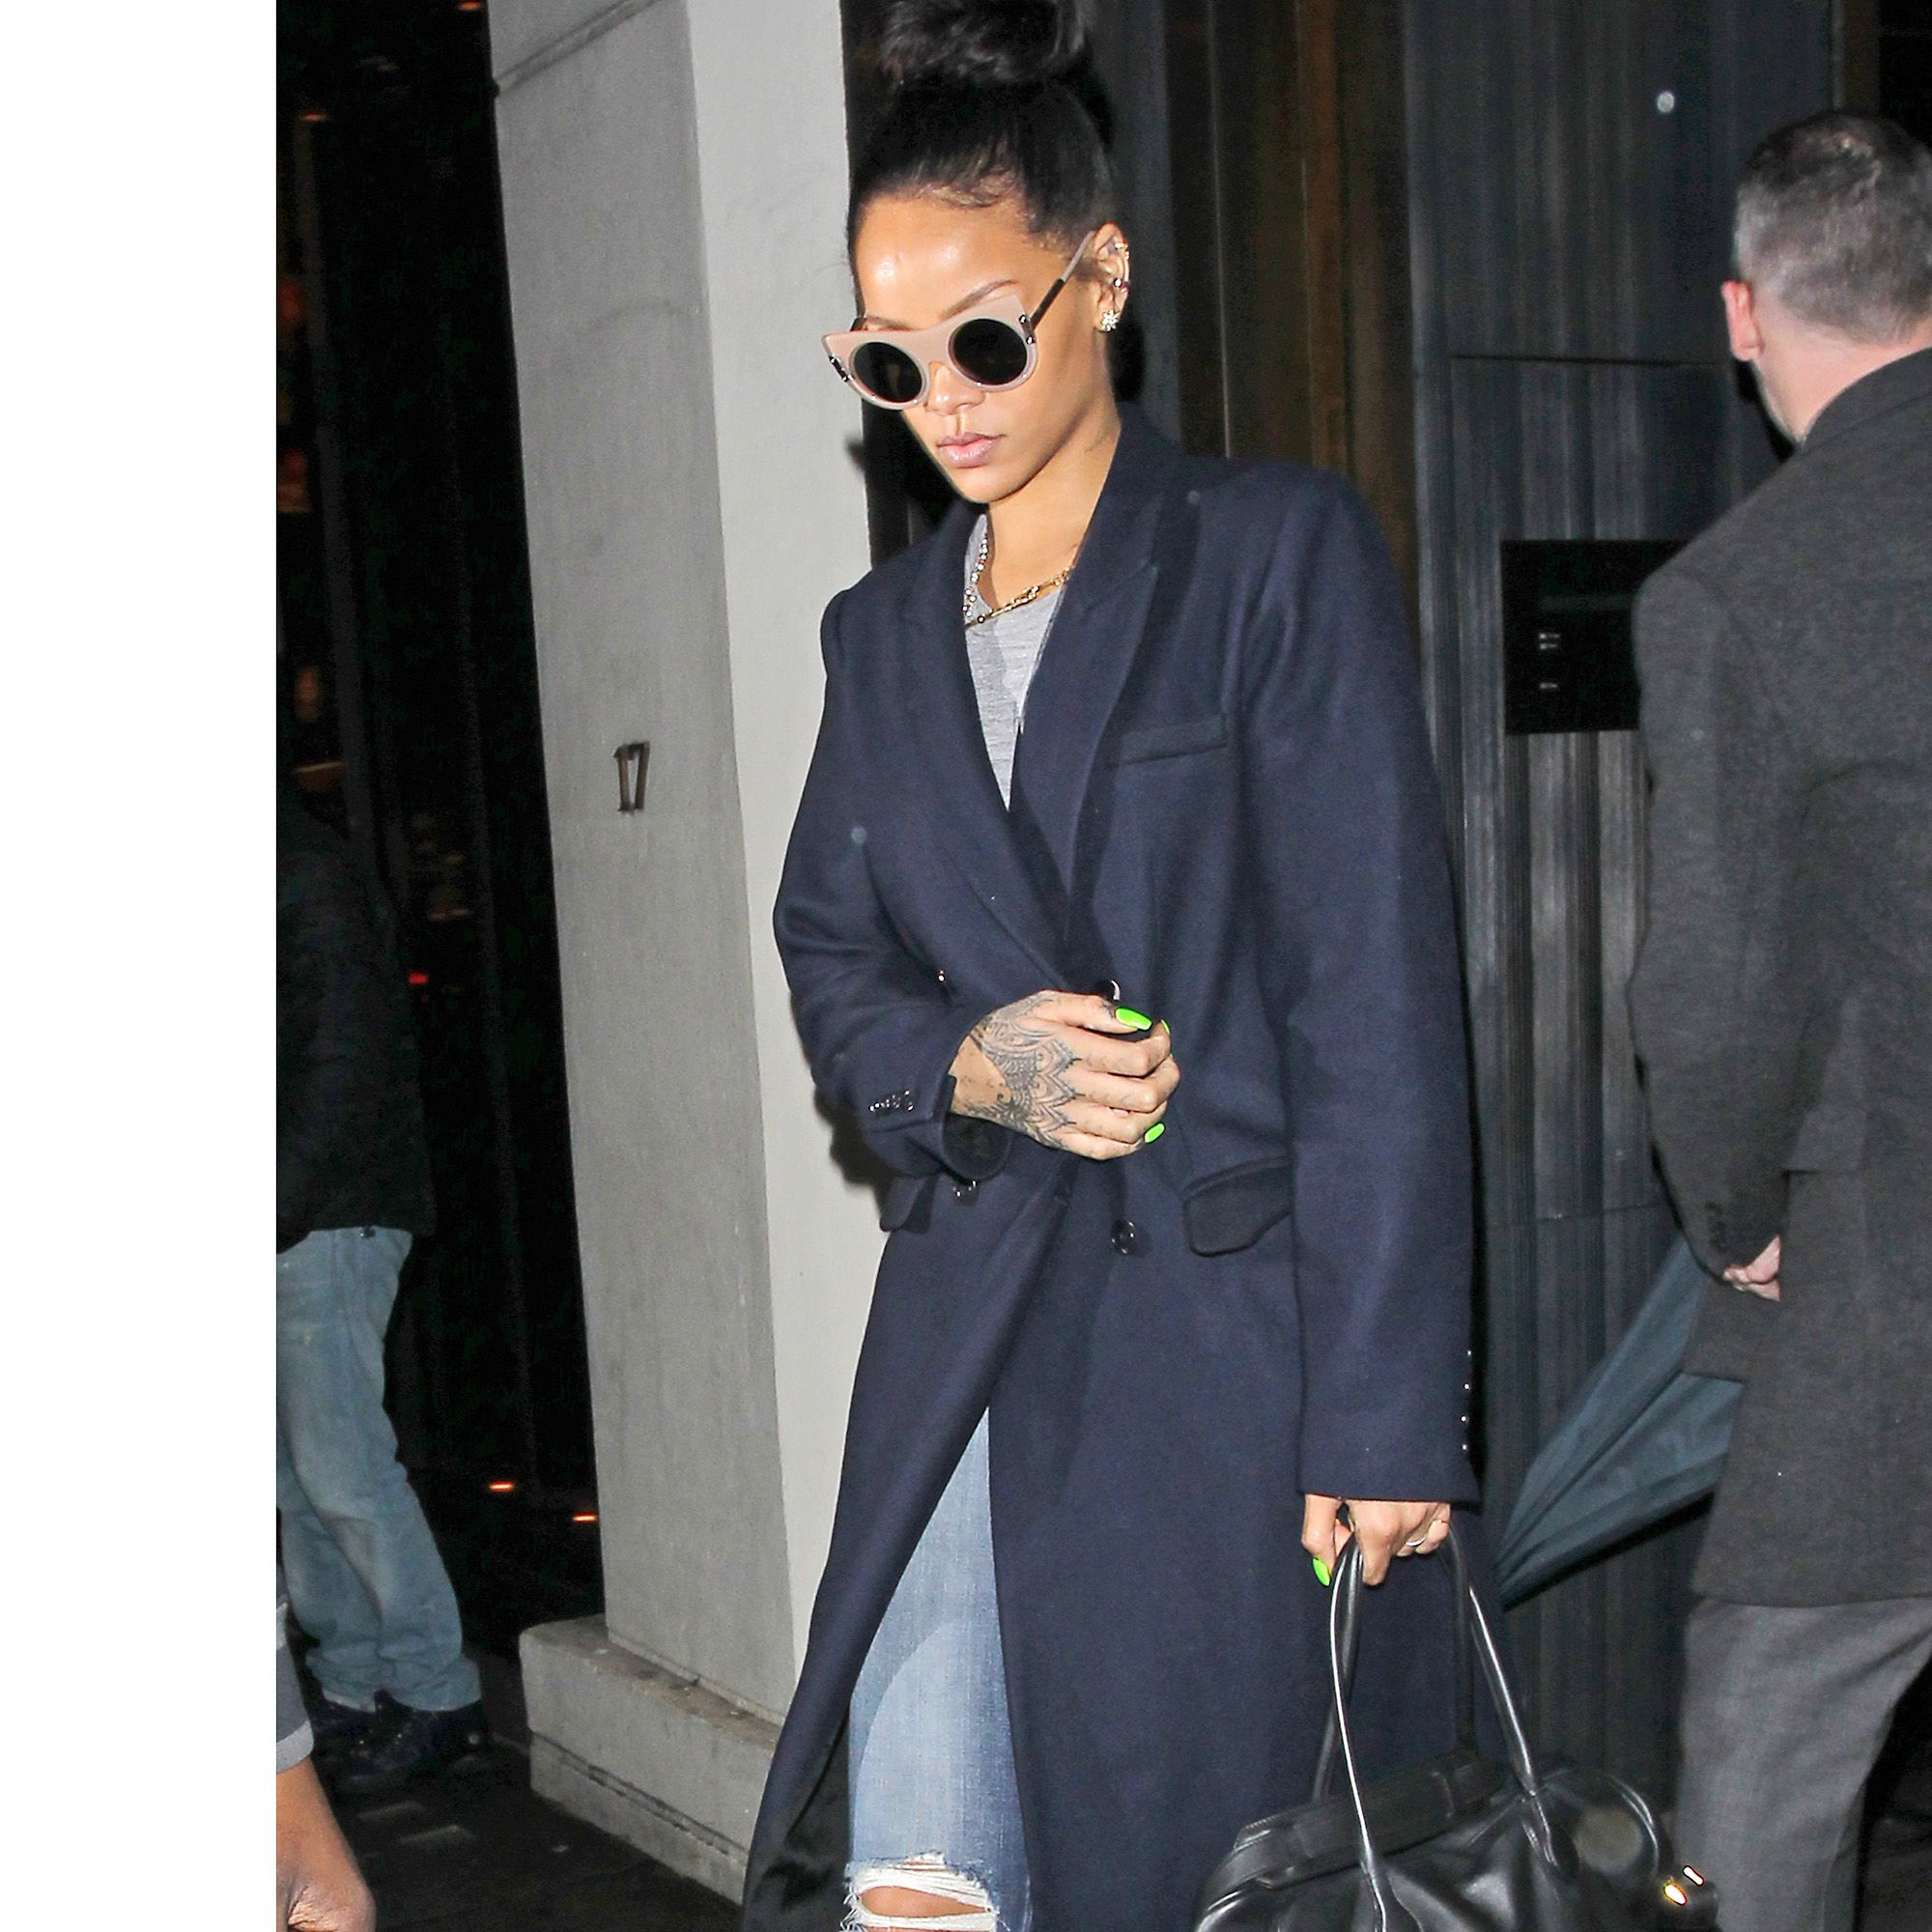 LONDON, ENGLAND - DECEMBER 02:  Rihanna seen leaving Hakkasan Restaurant in Mayfair on December 2, 2014 in London, England.  (Photo by Neil Mockford/Alex Huckle/GC Images)